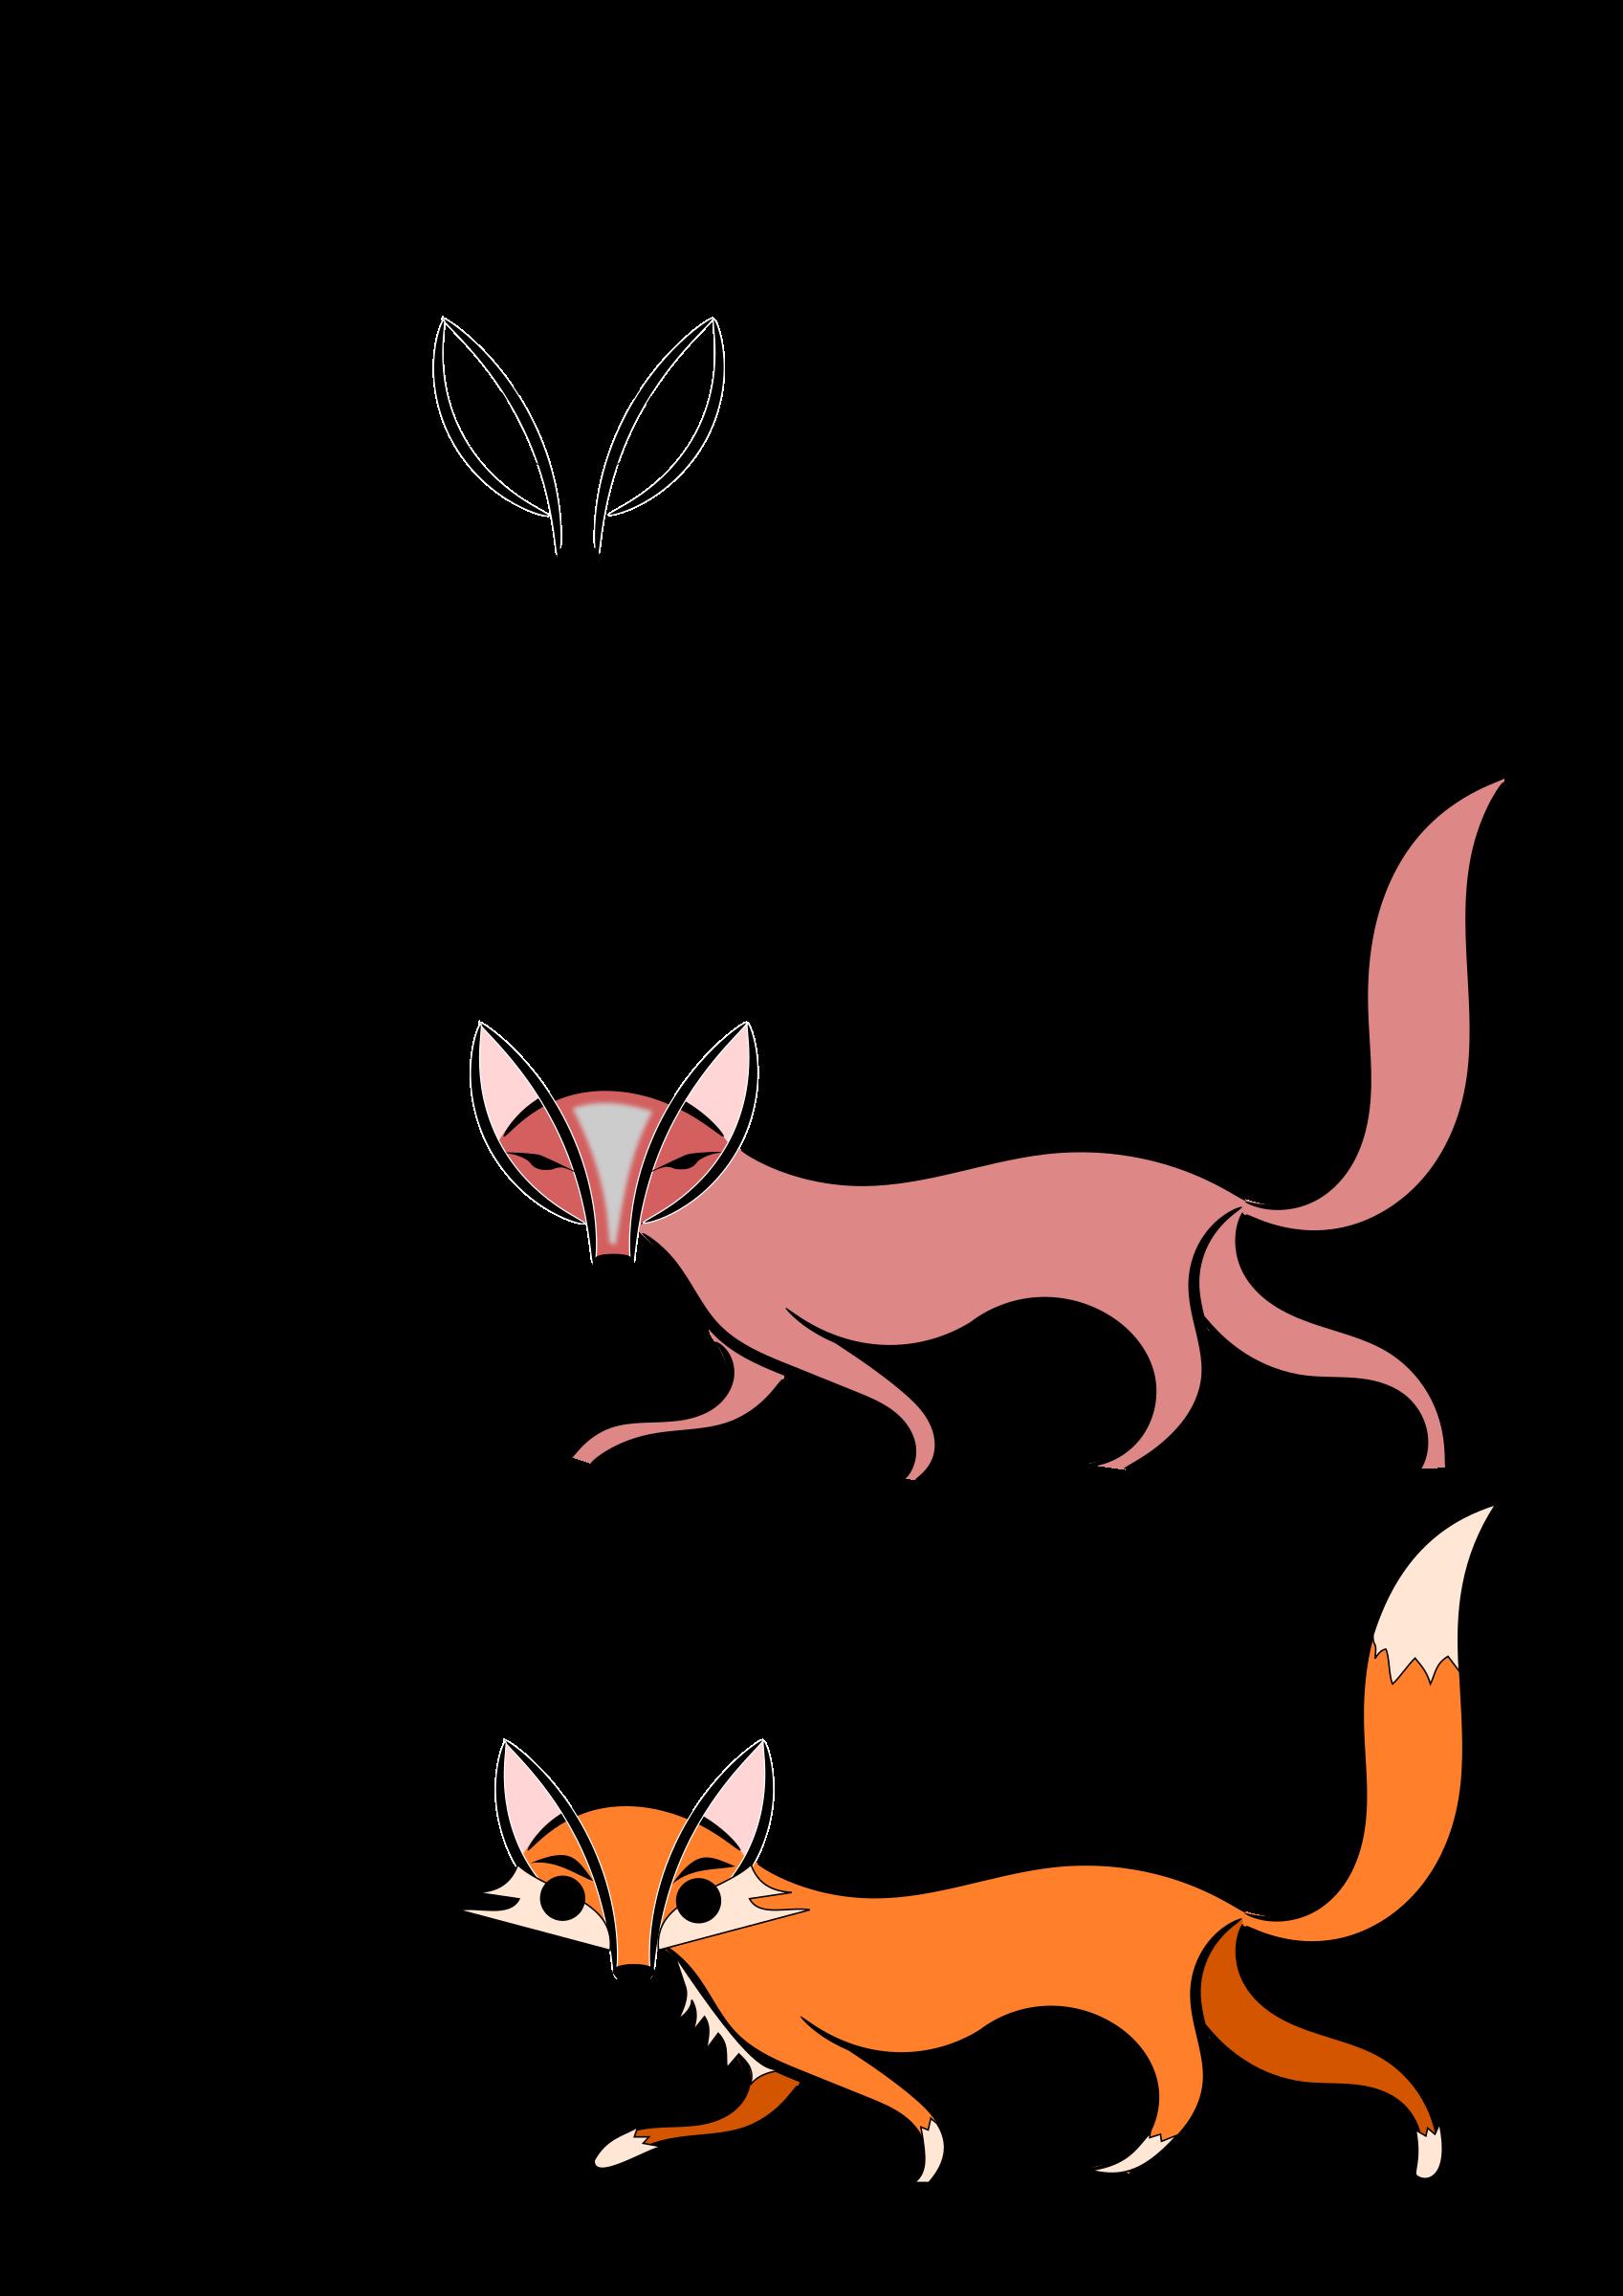 Nose clipart fox. Evolution big image png